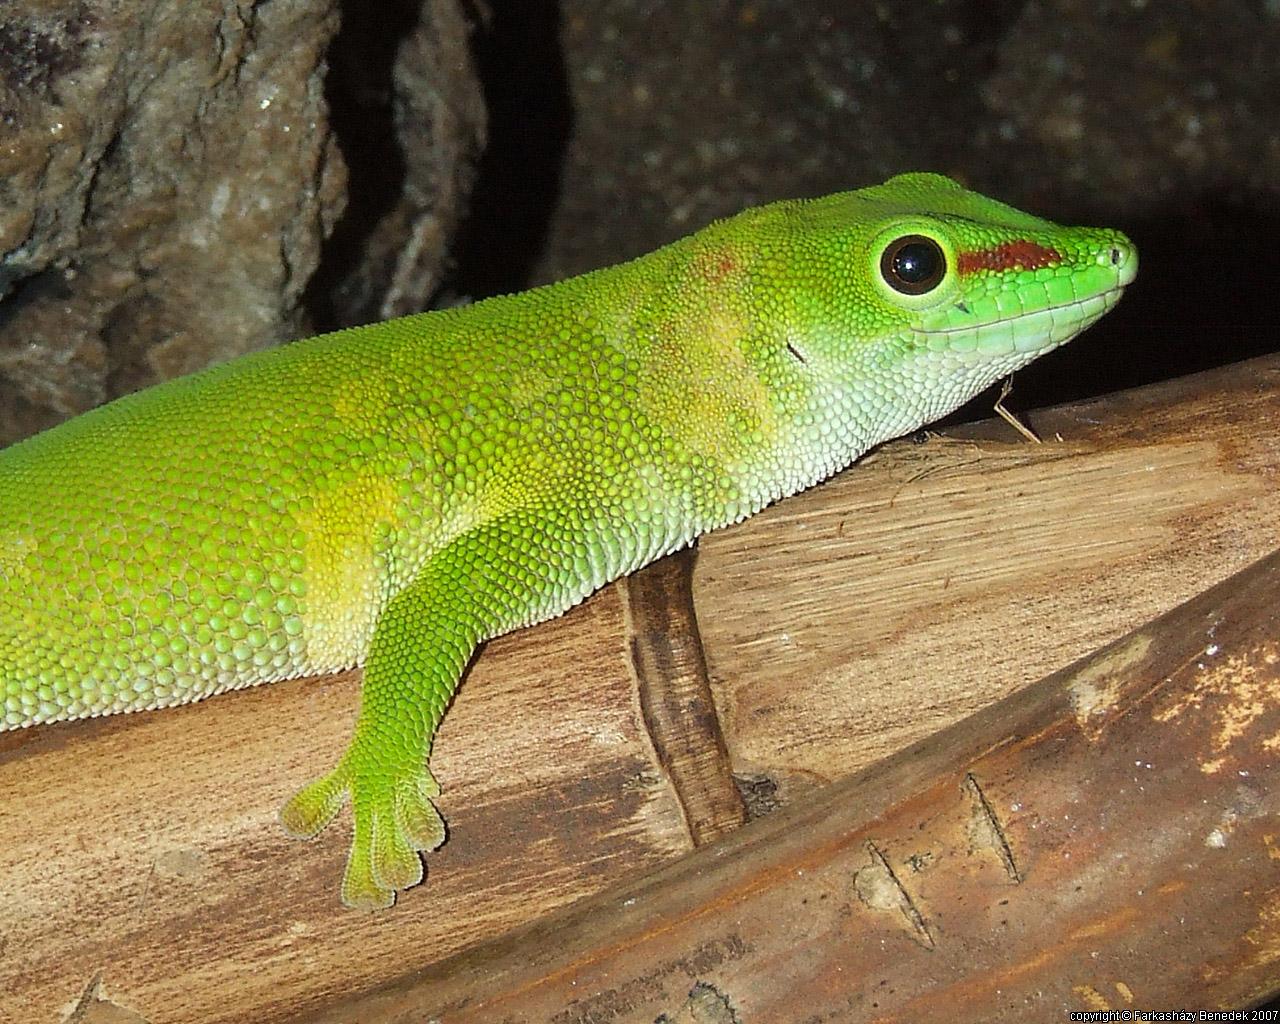 Lizard - HD Wallpapers | Earth Blog